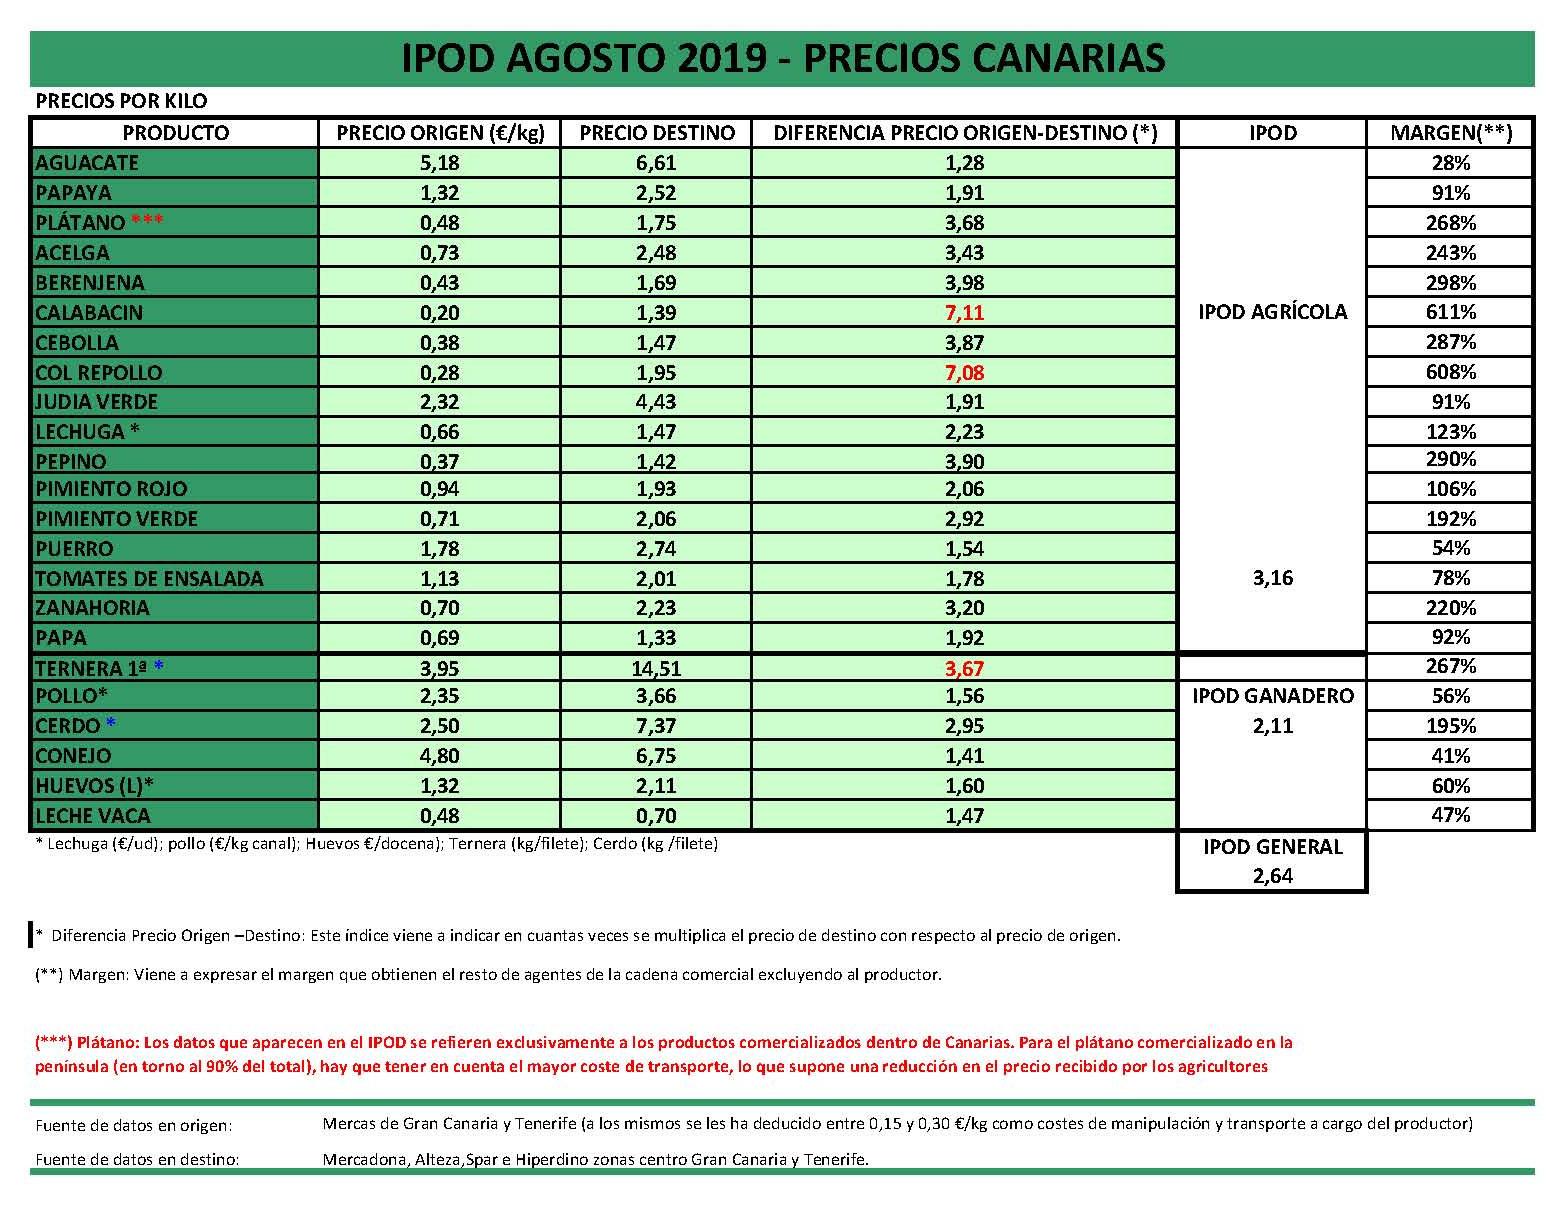 IPOD CANARIAS 08.19